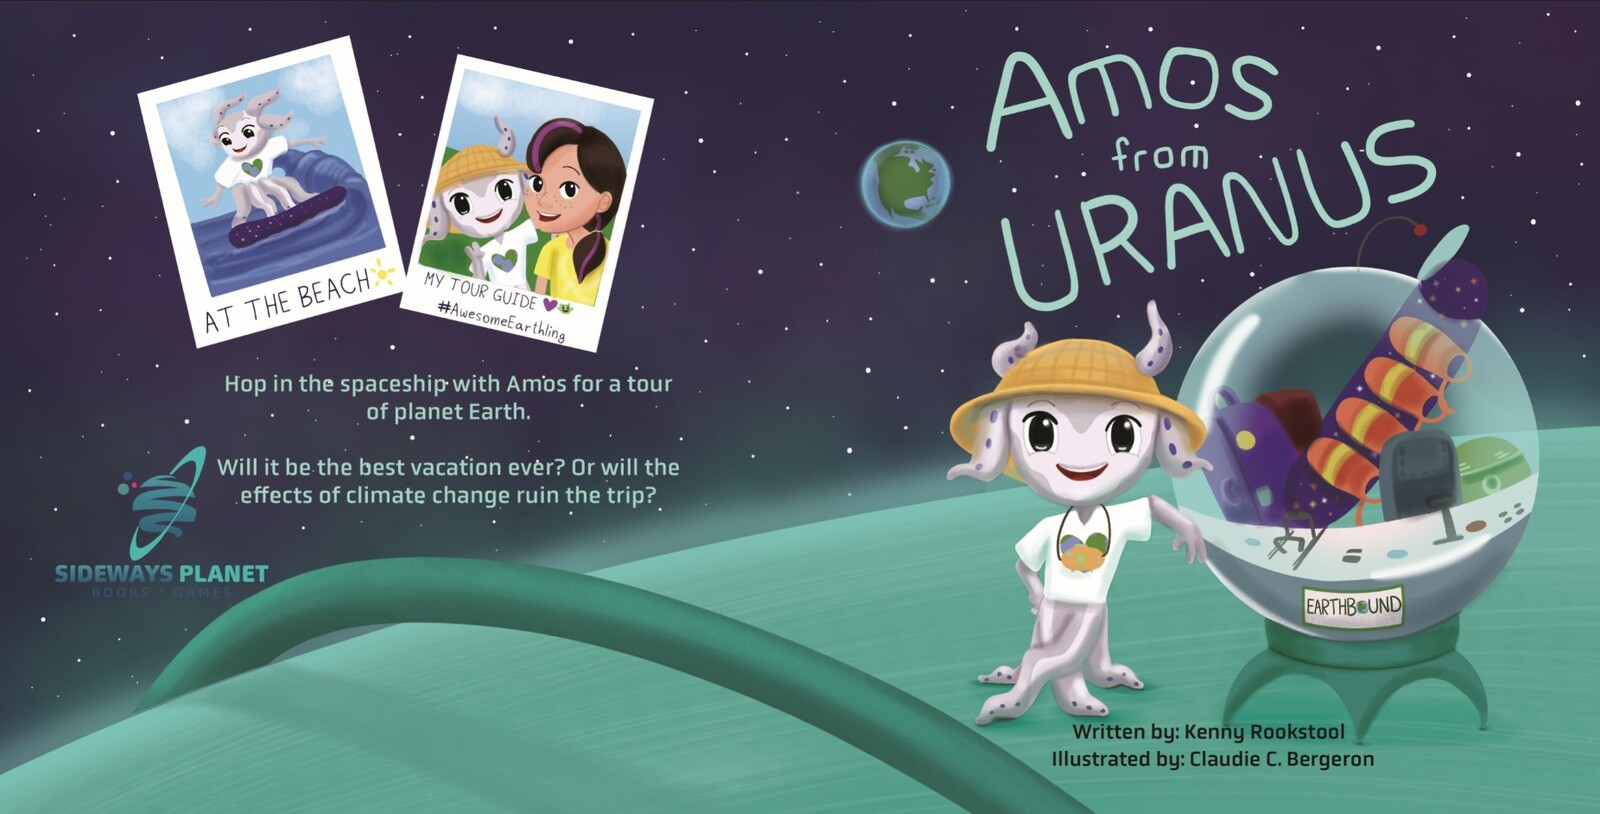 Amos from Uranus